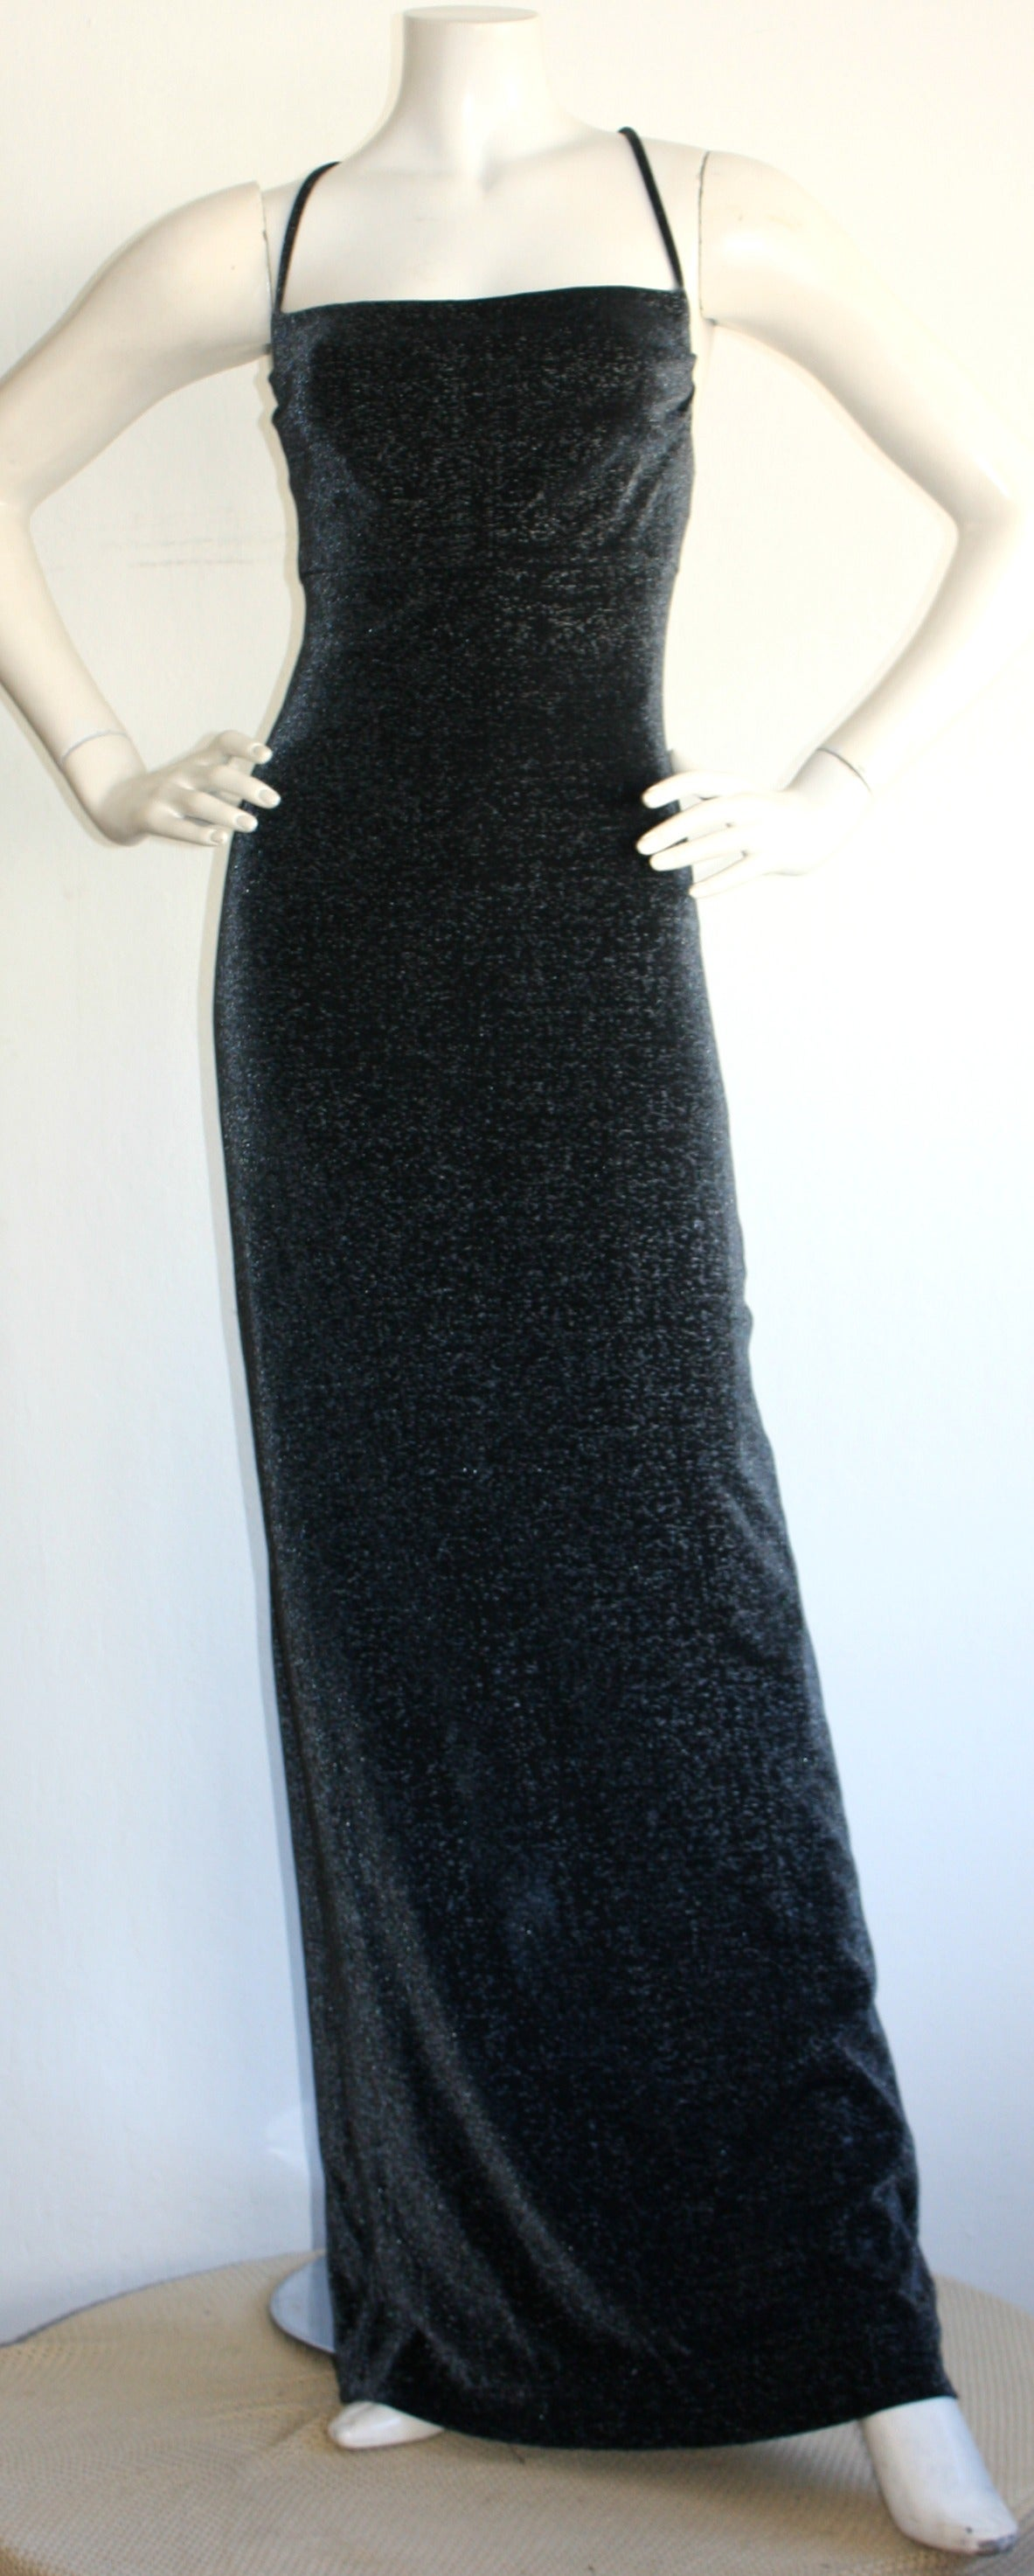 1990s Vintage Gianni Versace Pre-Death Versus Silver Metallic Criss Cross Gown 5